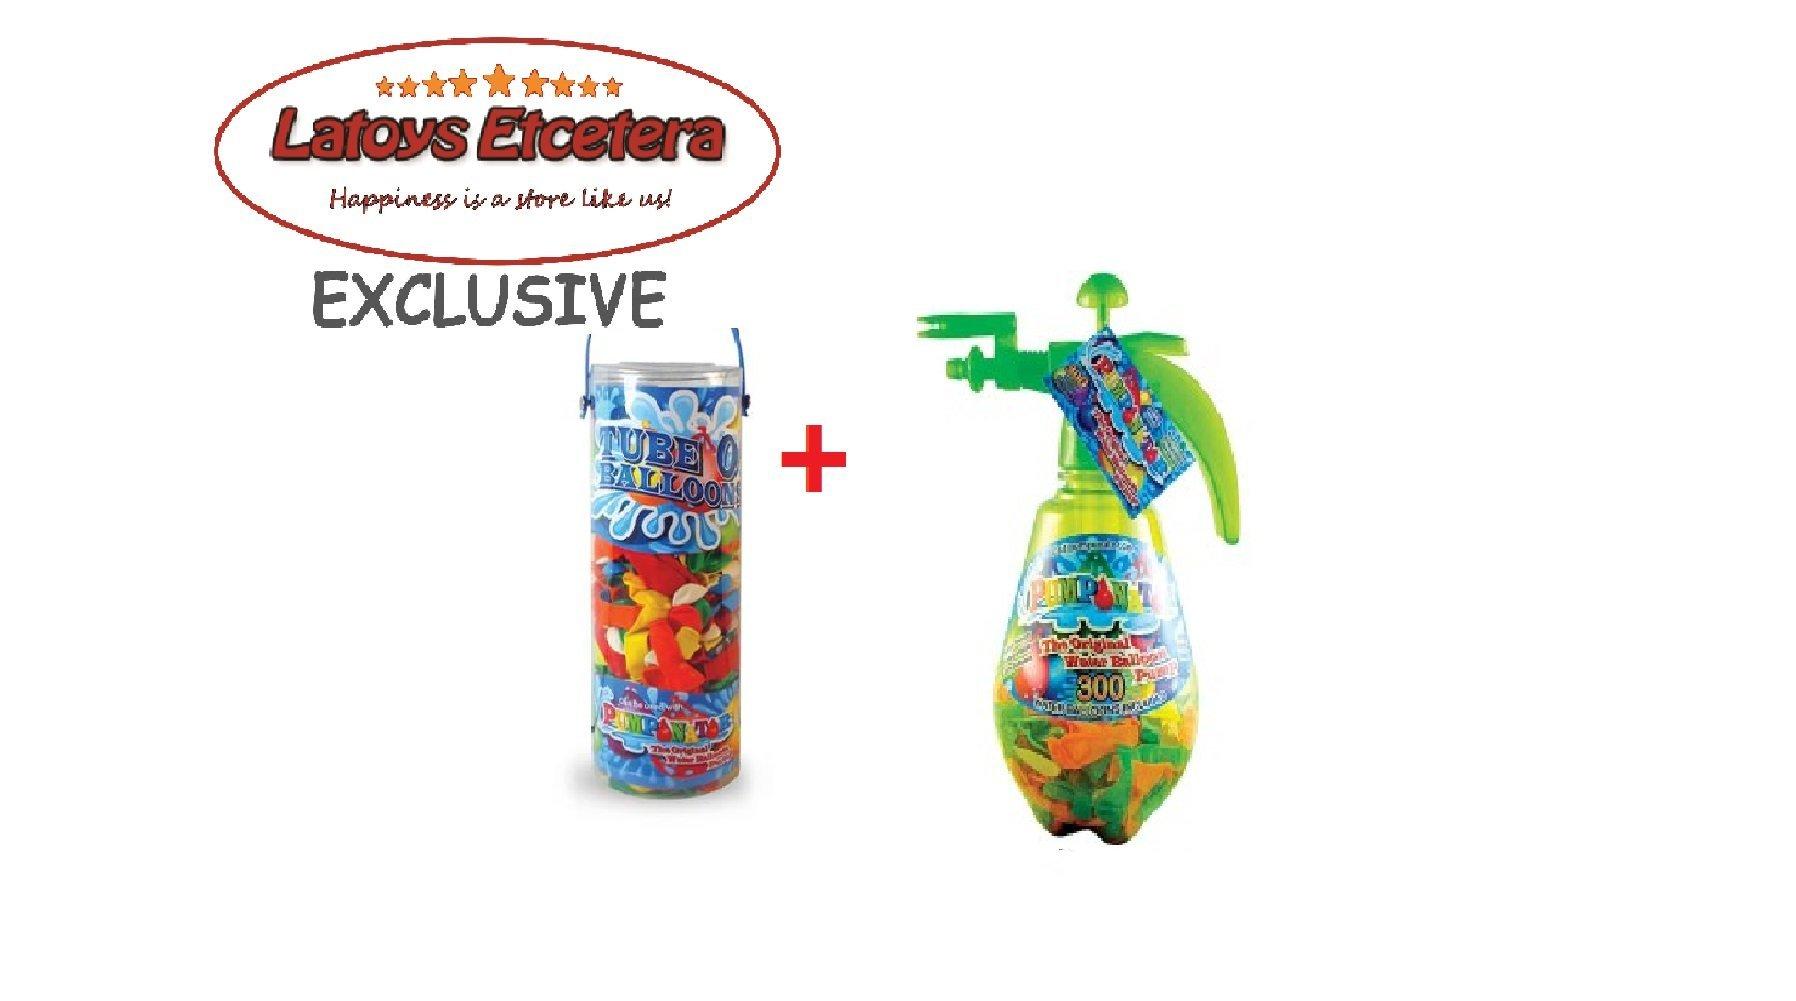 Pumponator Water Balloon Pump (Green) and Tube o' Balloons Gift Bundle Set